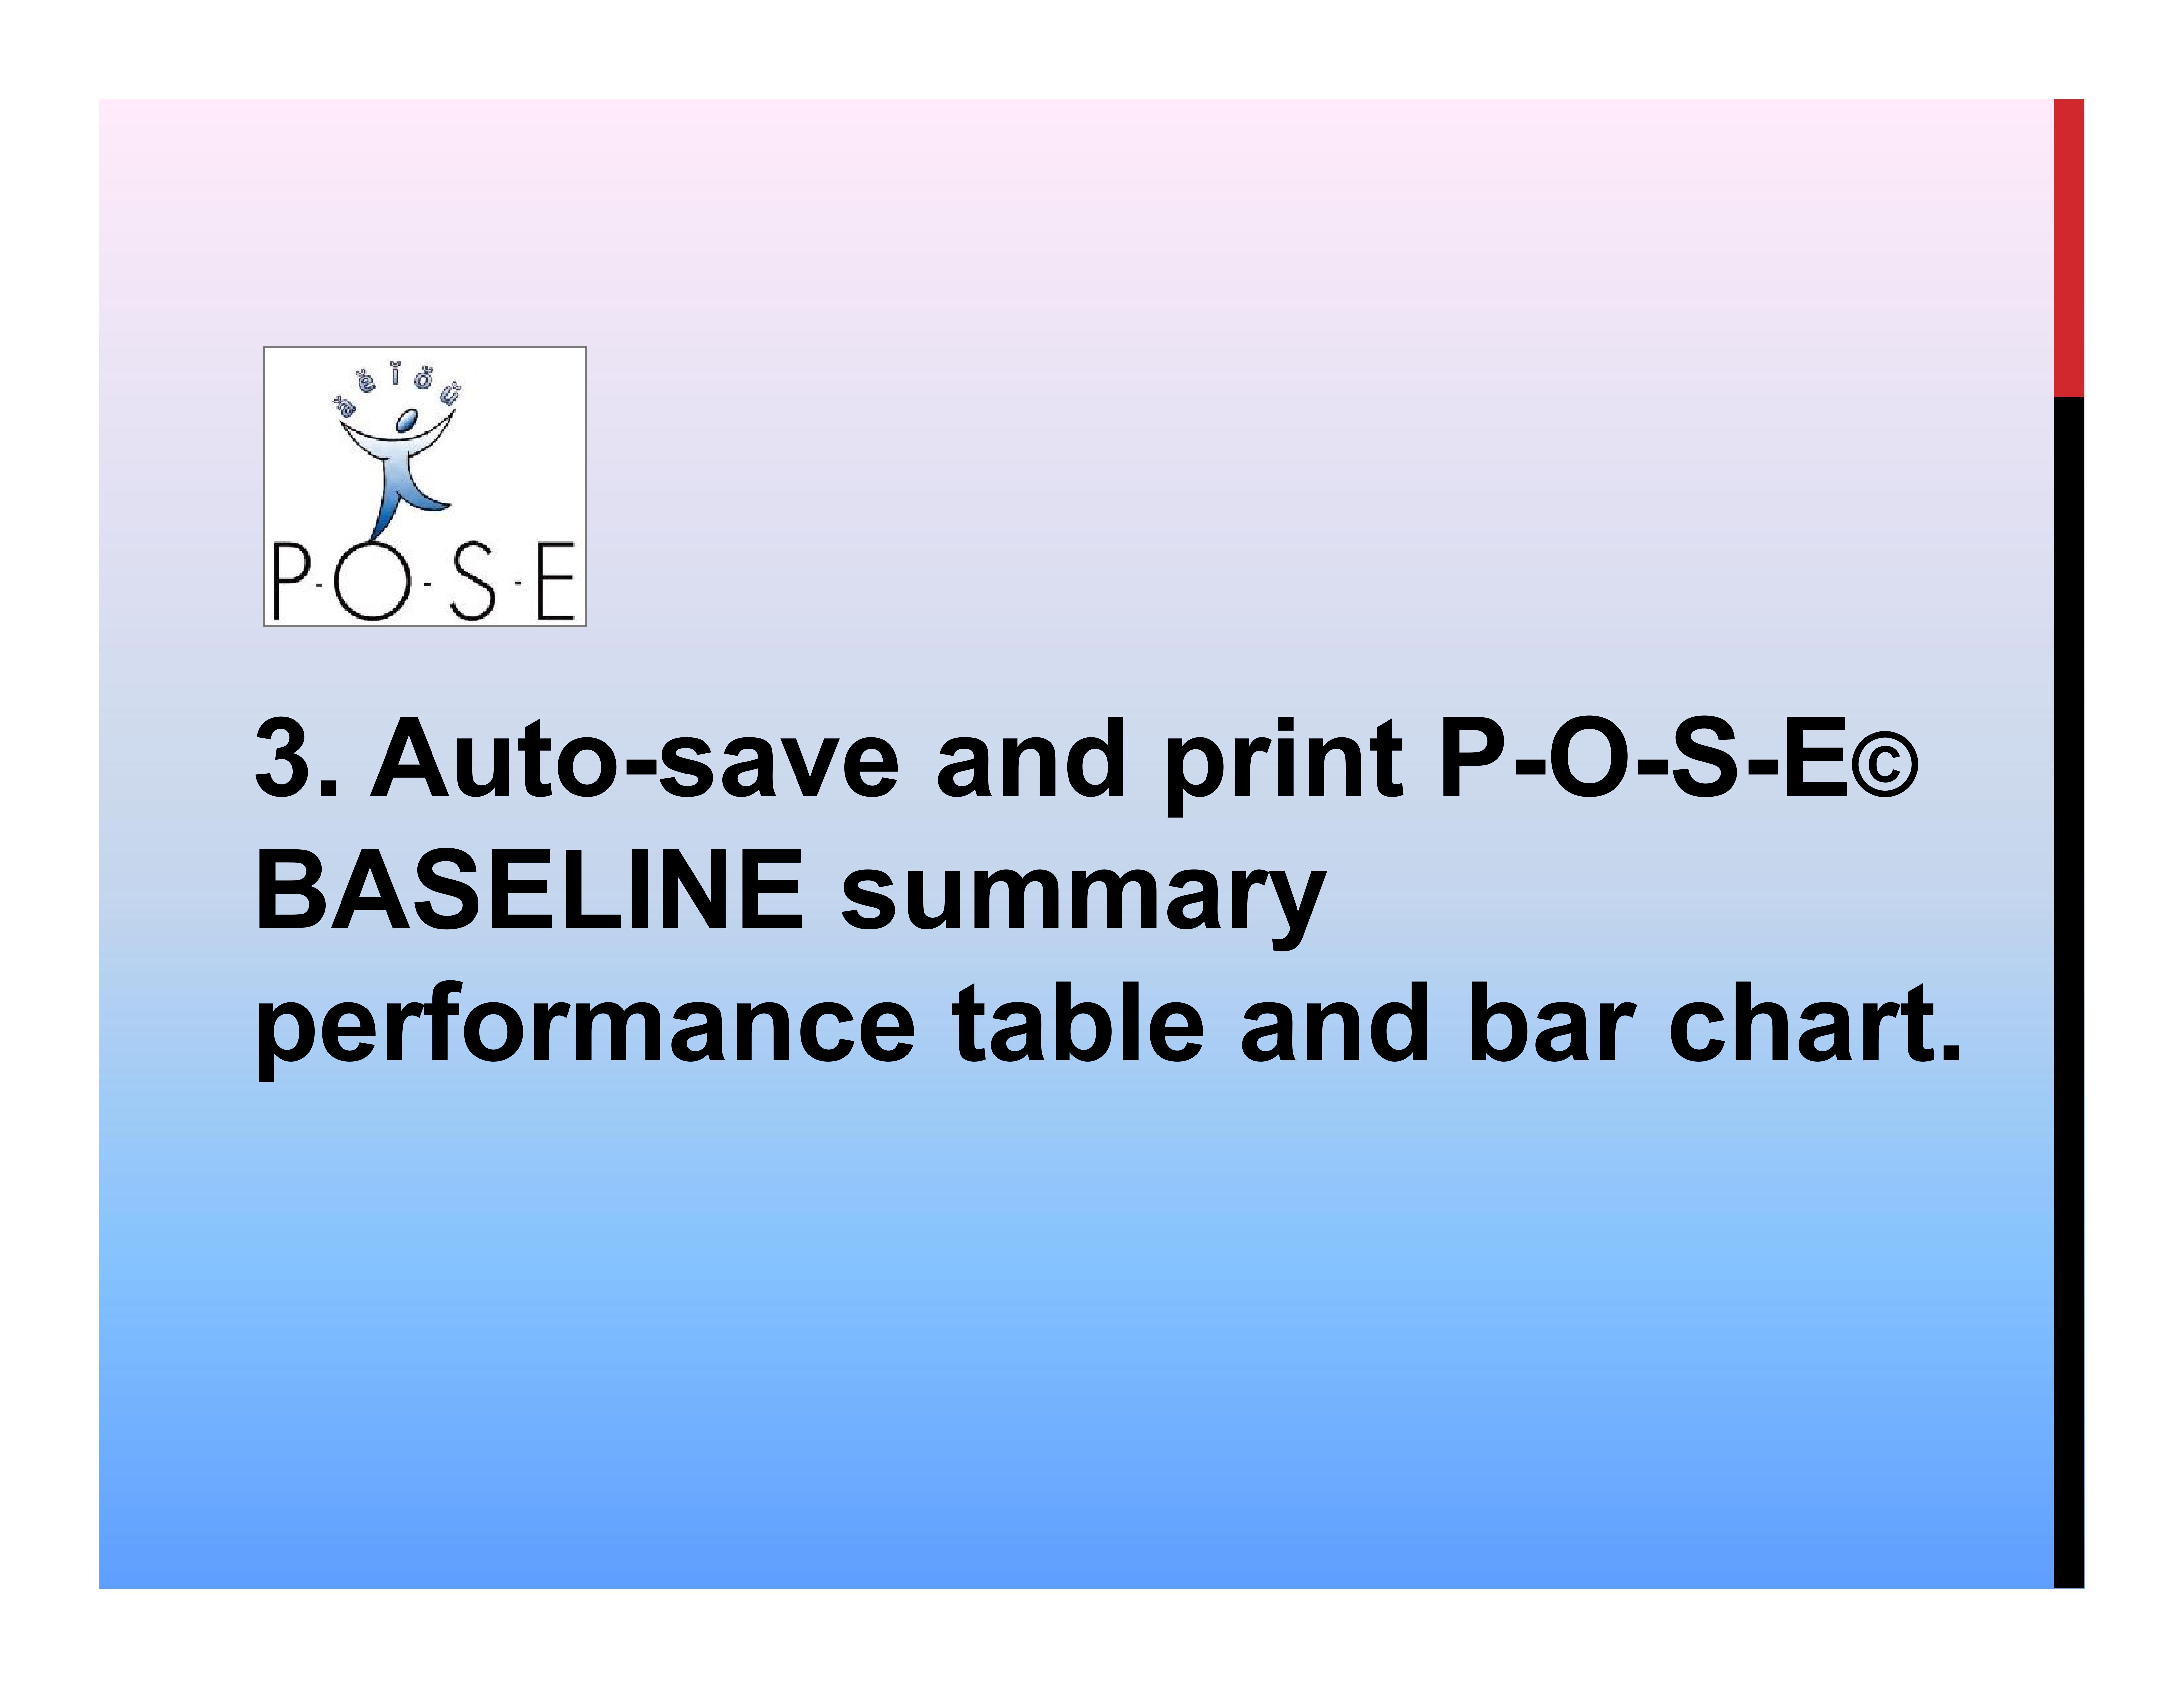 P-O-S-E literacy ELL phonology 5